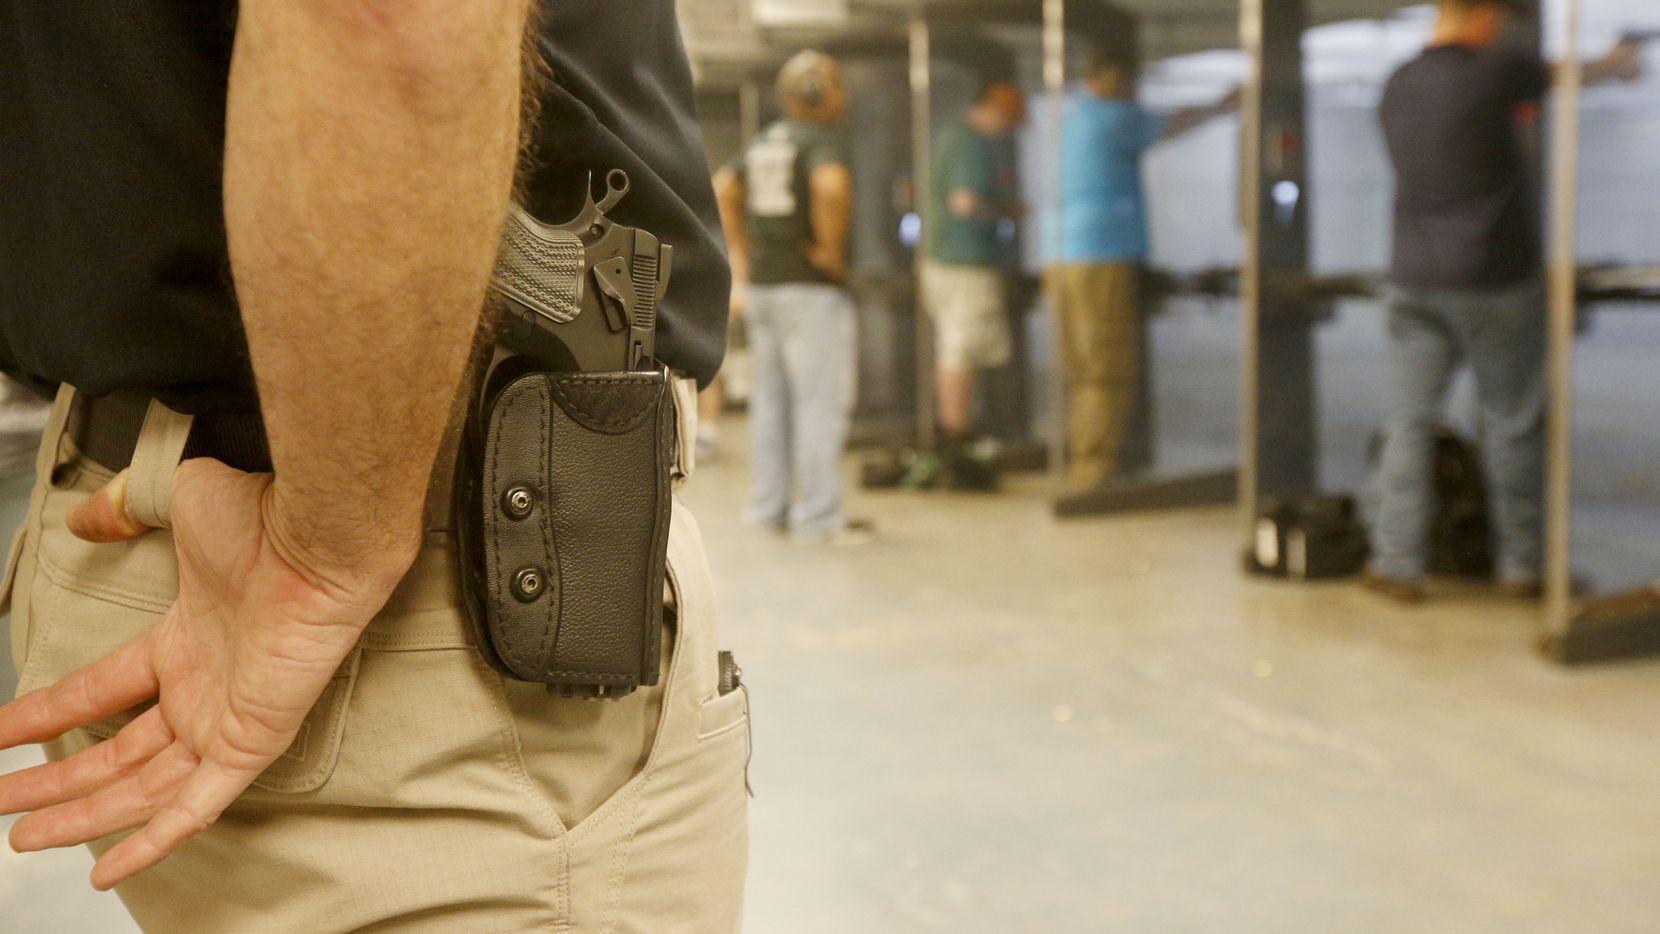 Shooting instructor Mark Brushwiller wears his gun on his hip at the Frisco Gun Club.